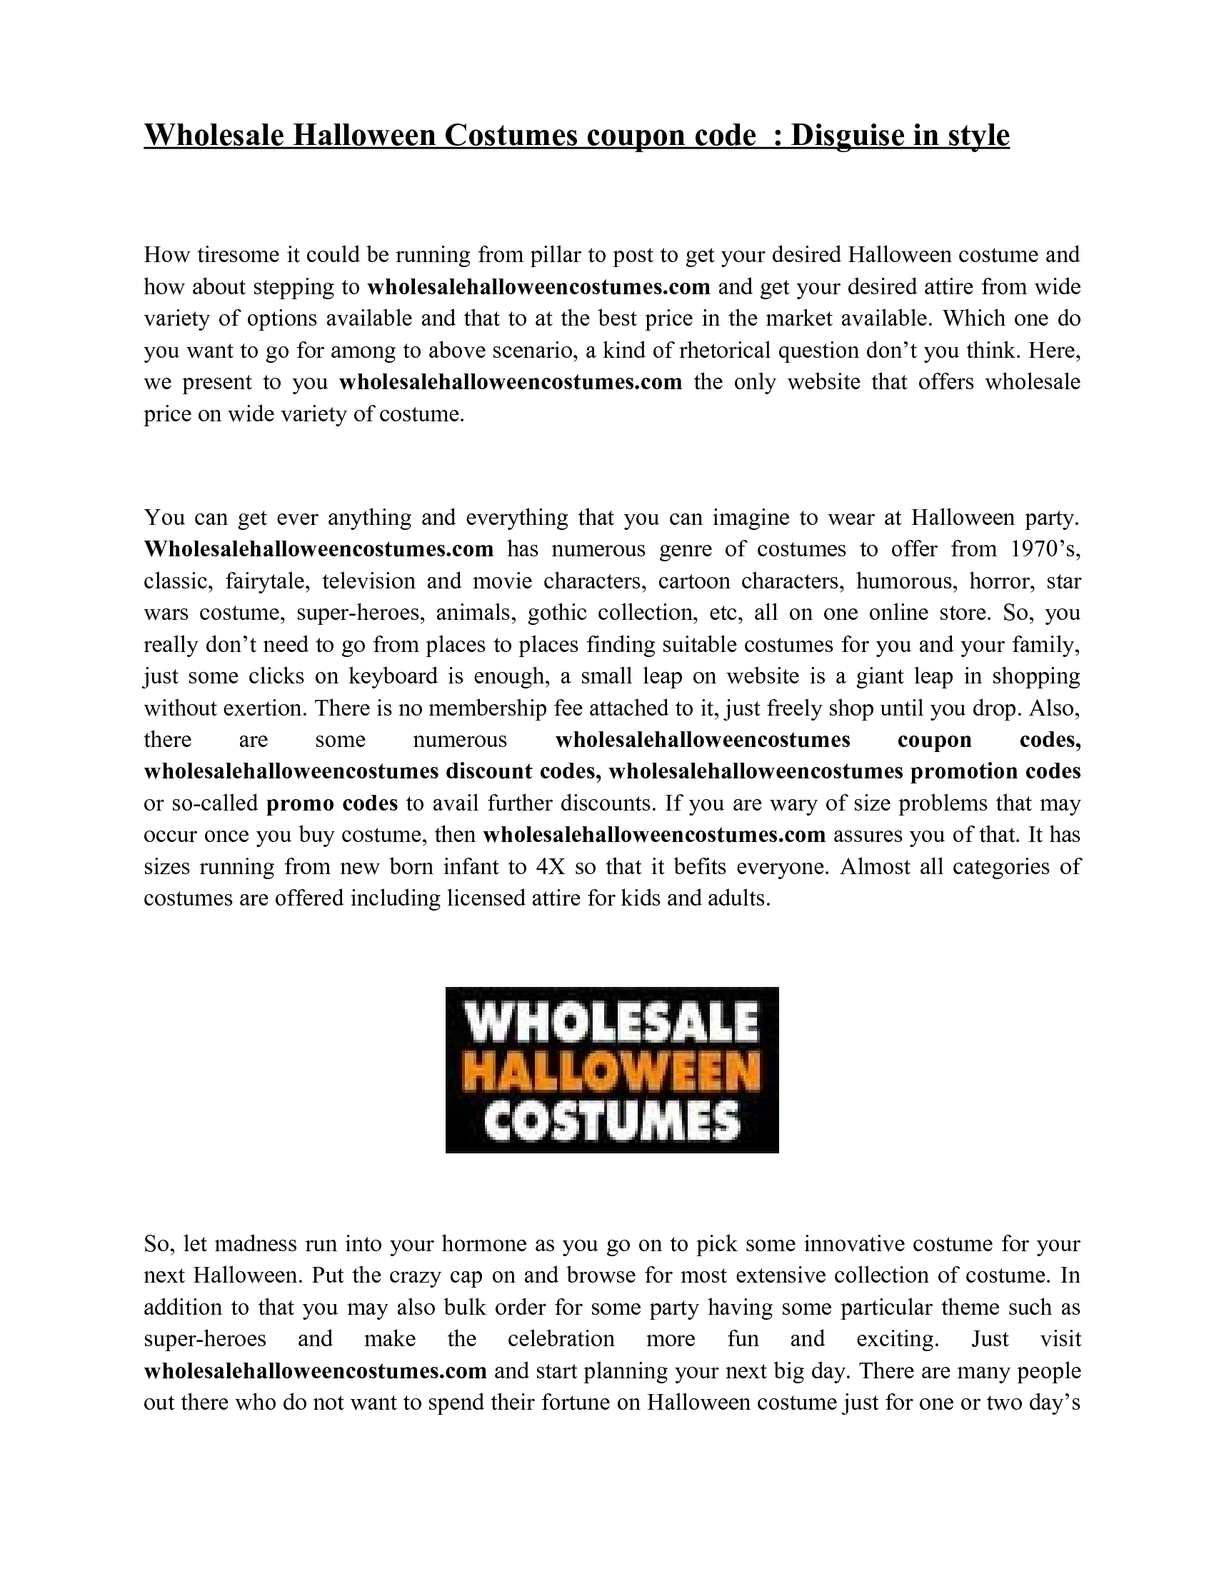 calamo wholesale halloween costumes coupon code